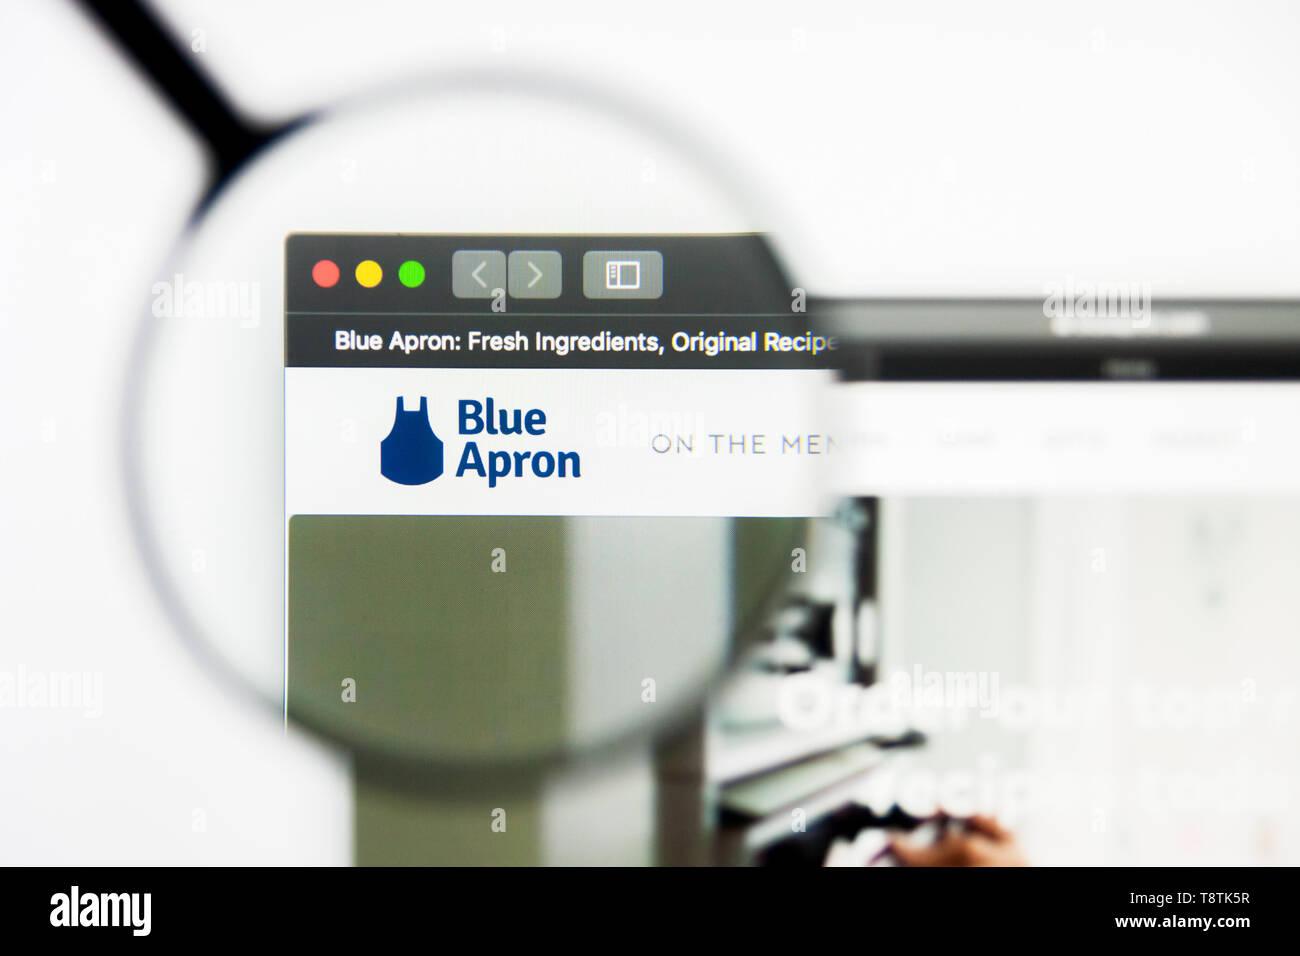 Blue Apron Logo Stock Photos & Blue Apron Logo Stock Images